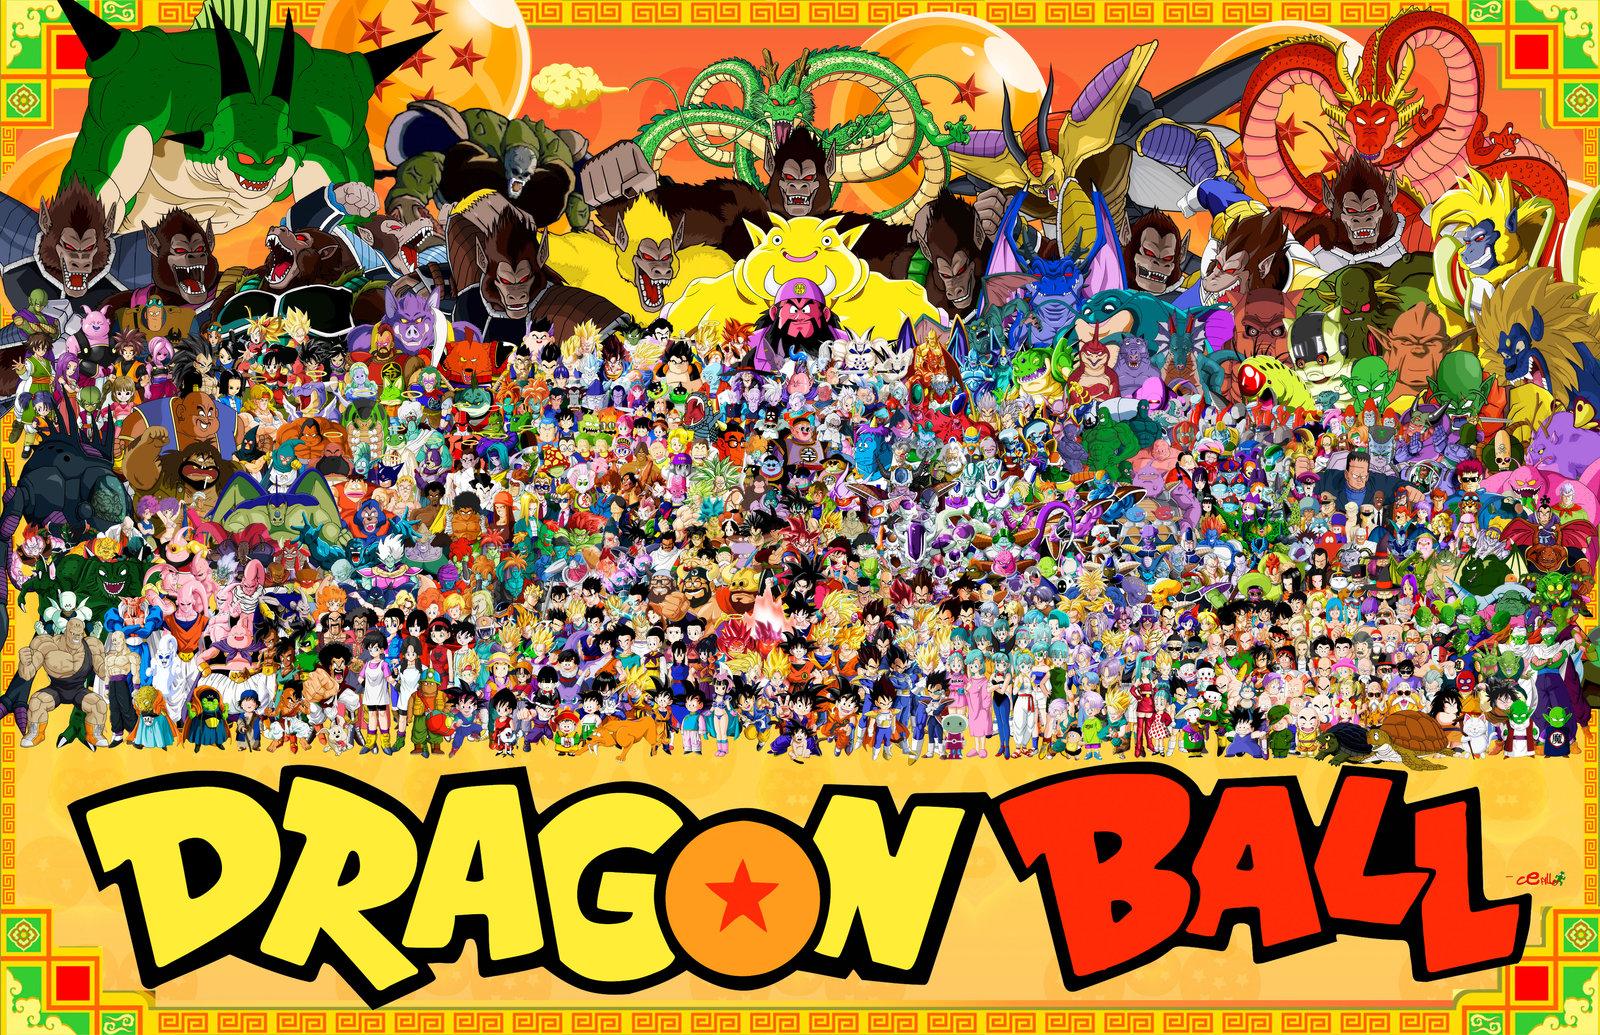 Dragon Ball Saga Dragon Ball Z Dragon Ball and Goku 1600x1035